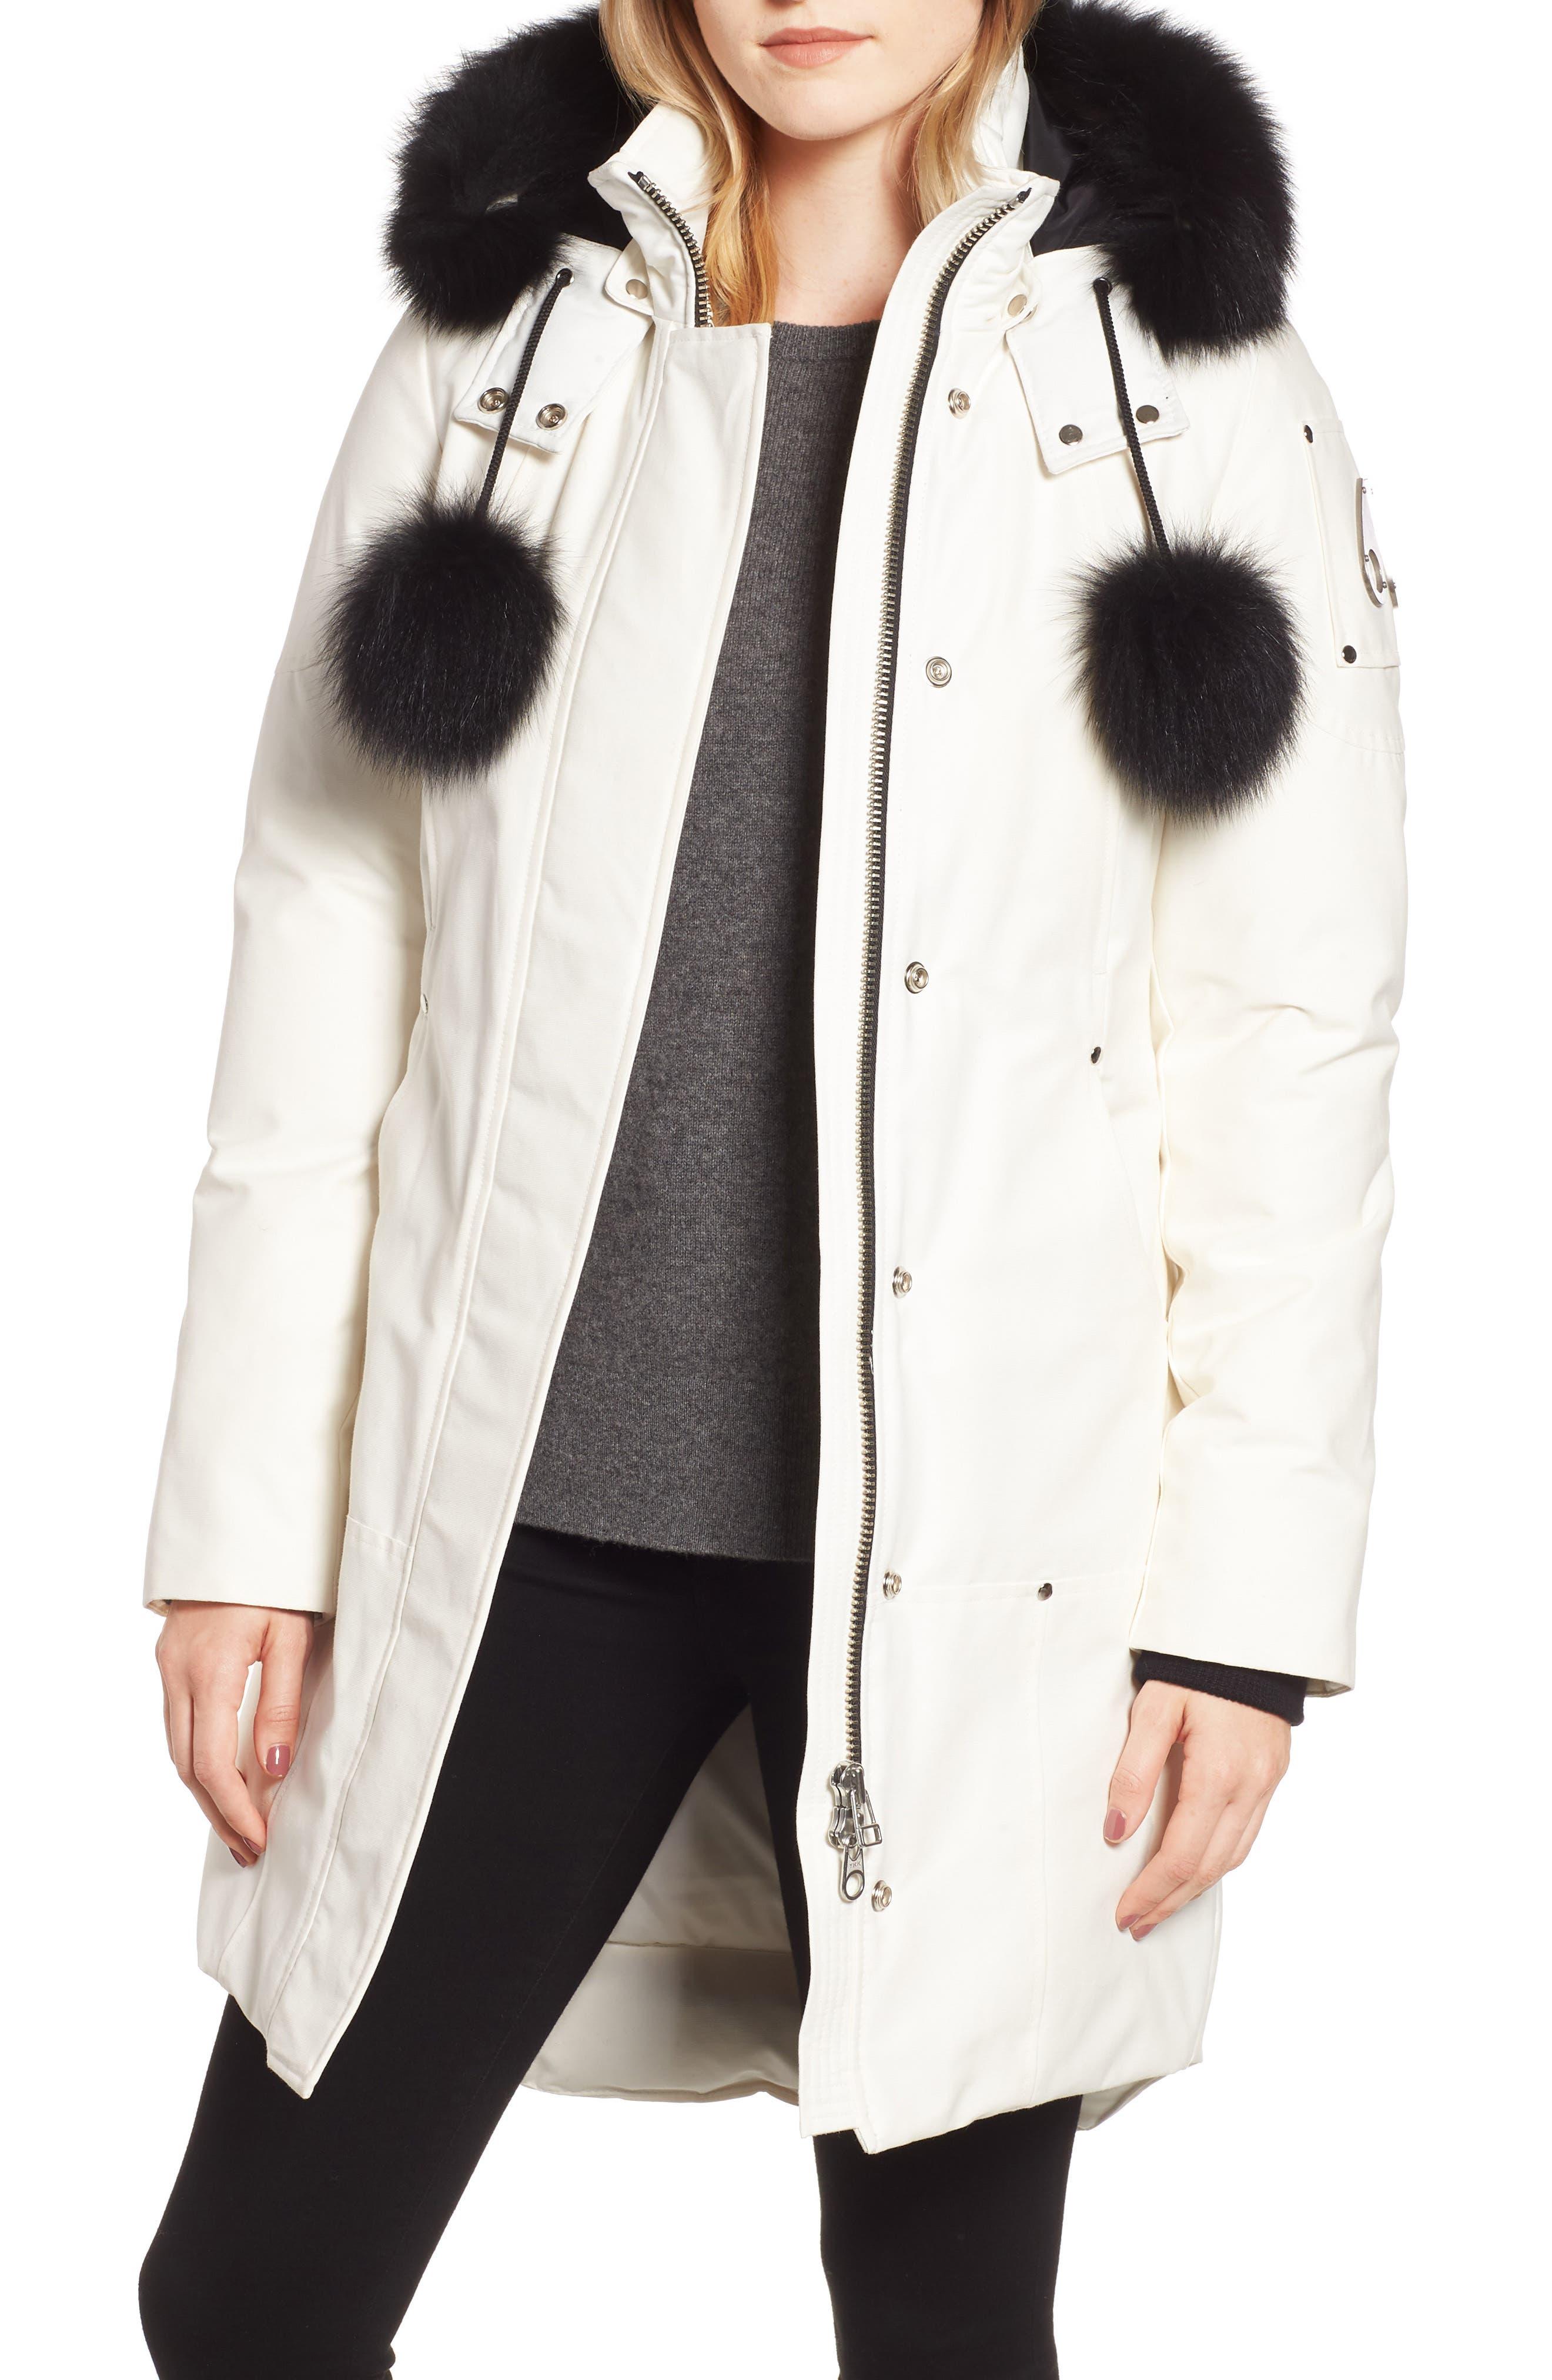 'Stirling' Down Parka with Genuine Fox Fur Trim,                         Main,                         color, SNOW WHITE/ BLACK FOX